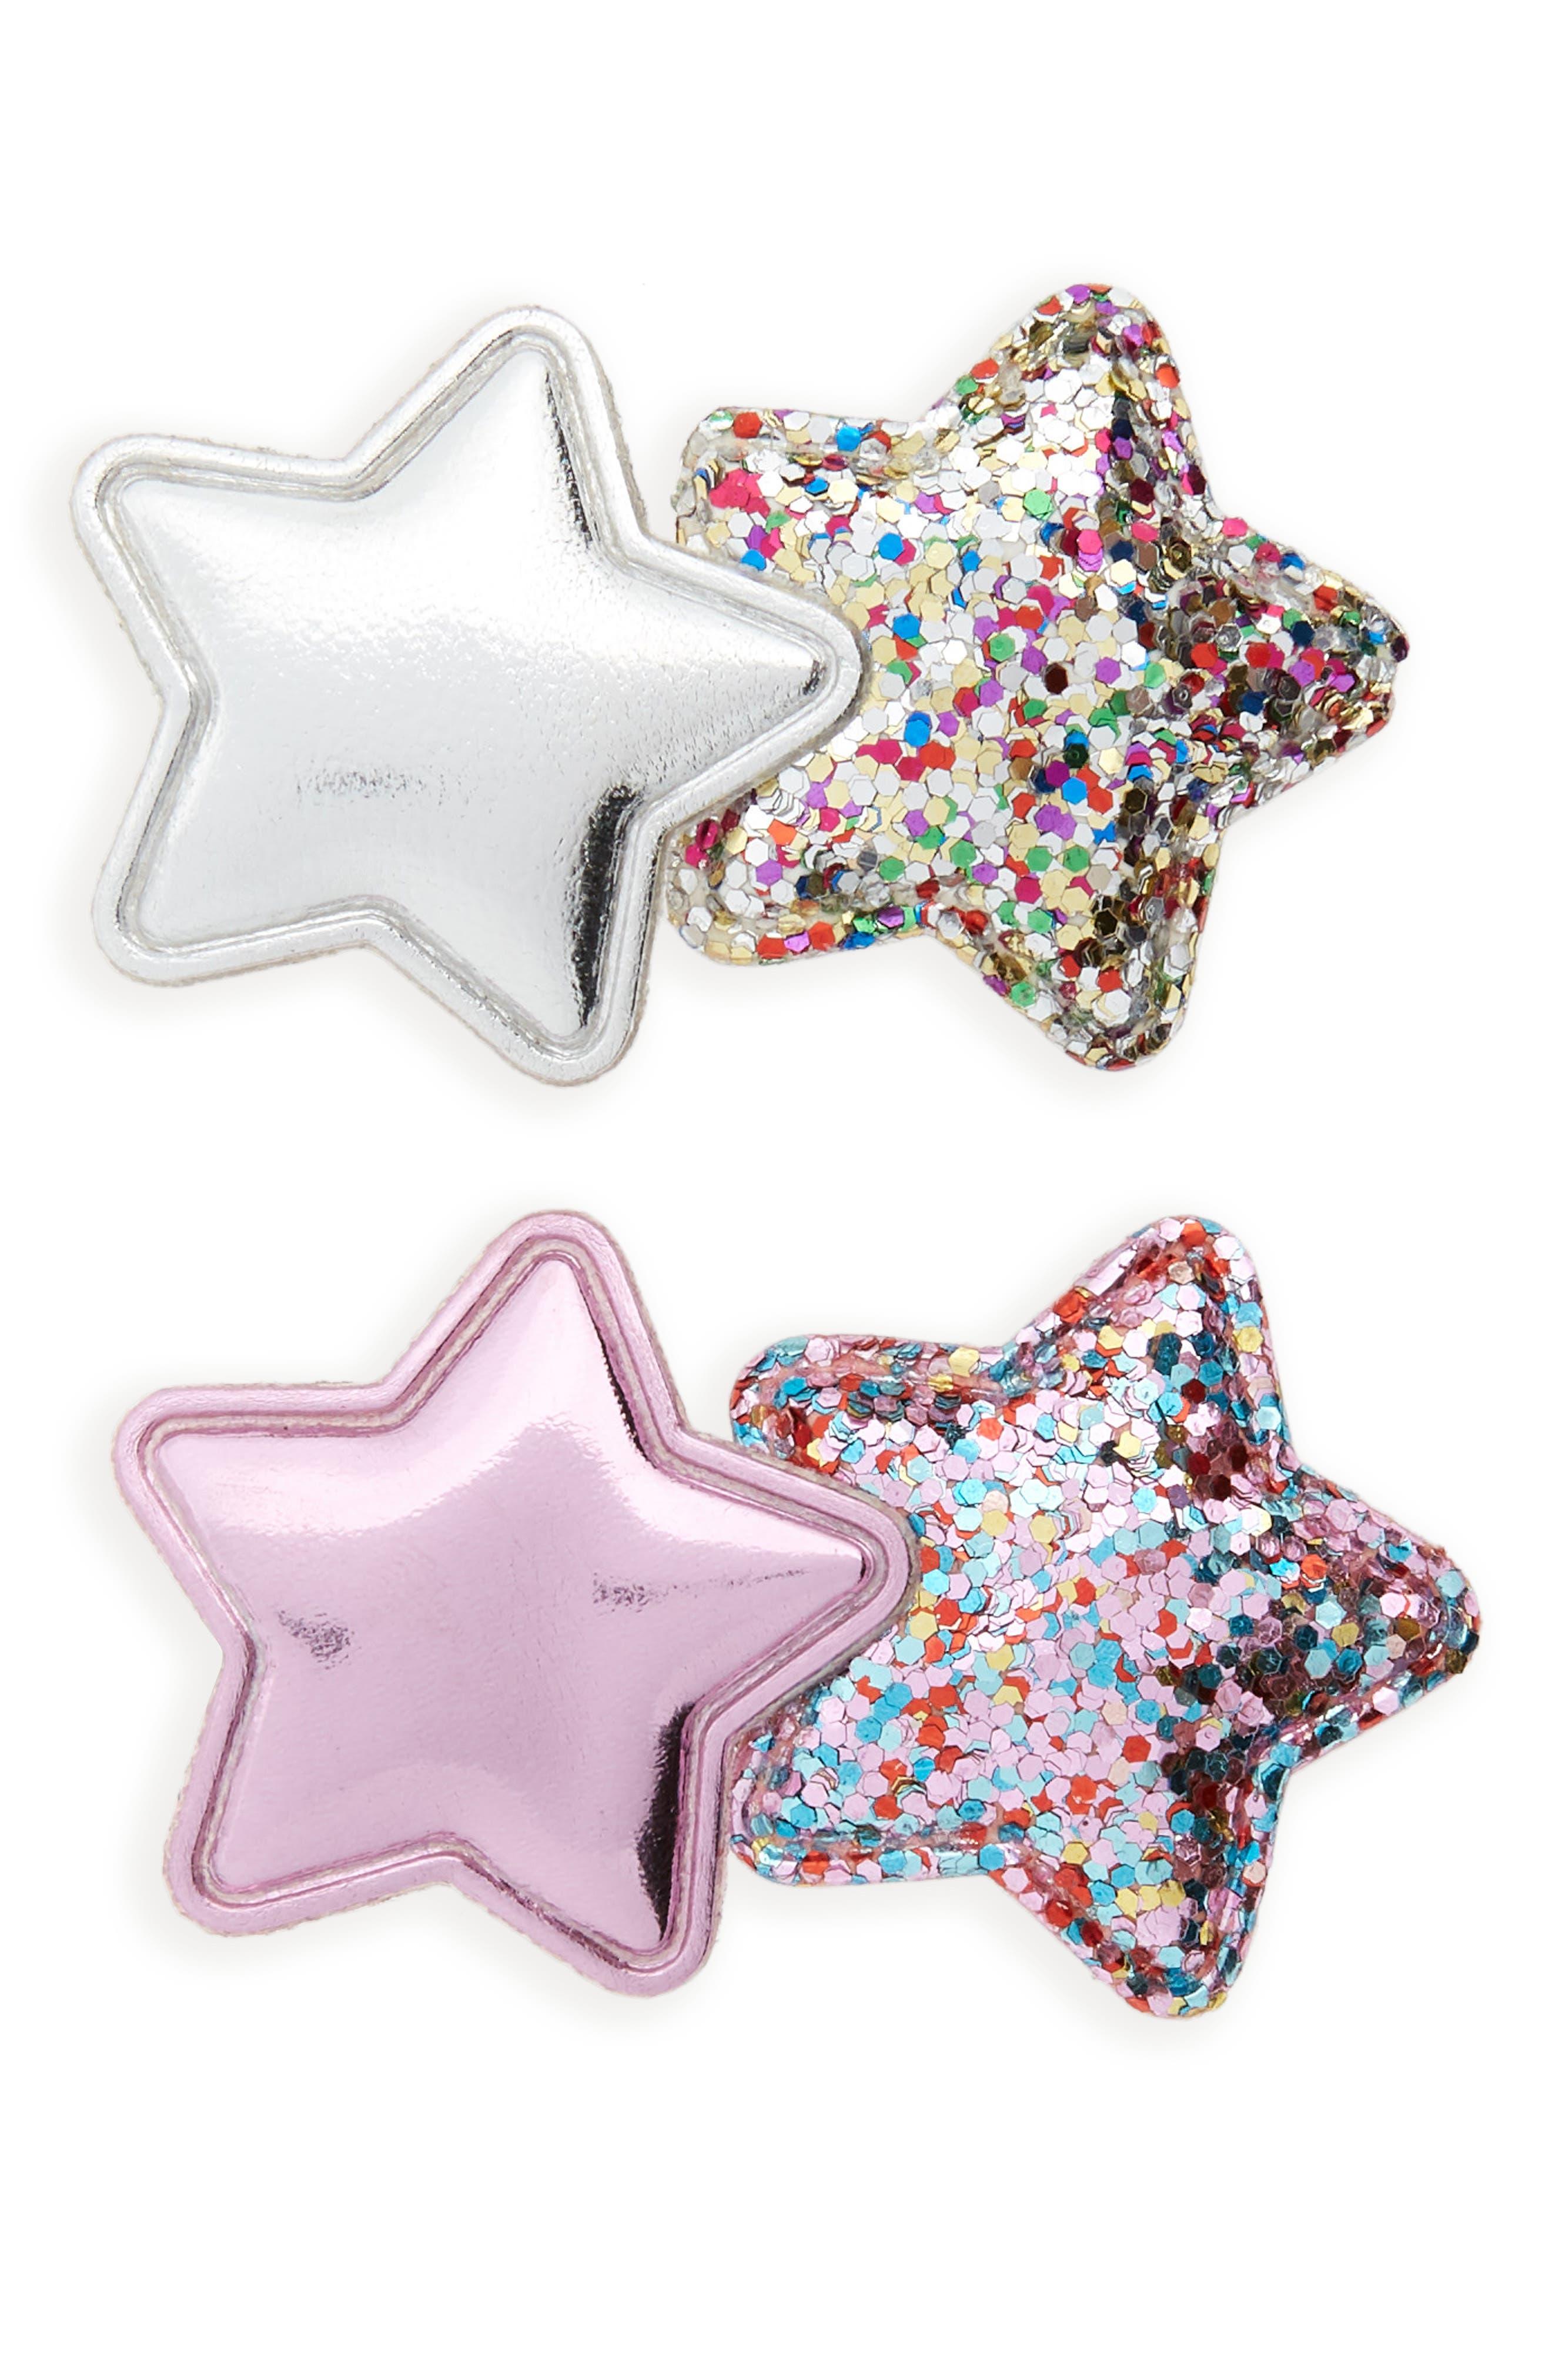 2-Pack Glitter Star Hair Clips,                             Main thumbnail 1, color,                             040